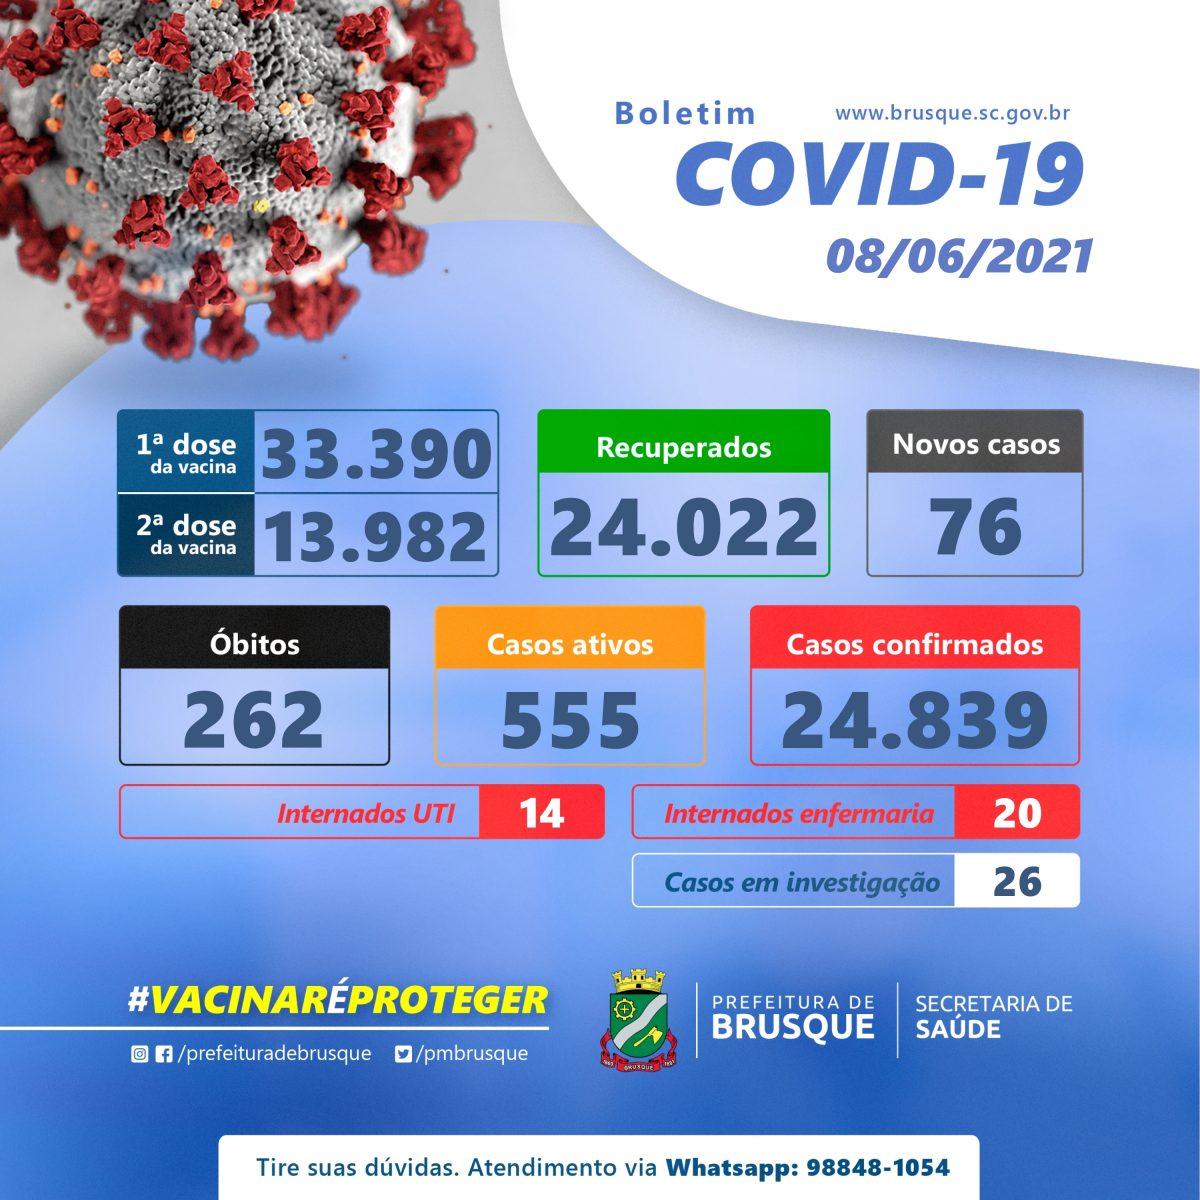 Covid 19: Confira o boletim epidemiológico desta terça-feira (08)